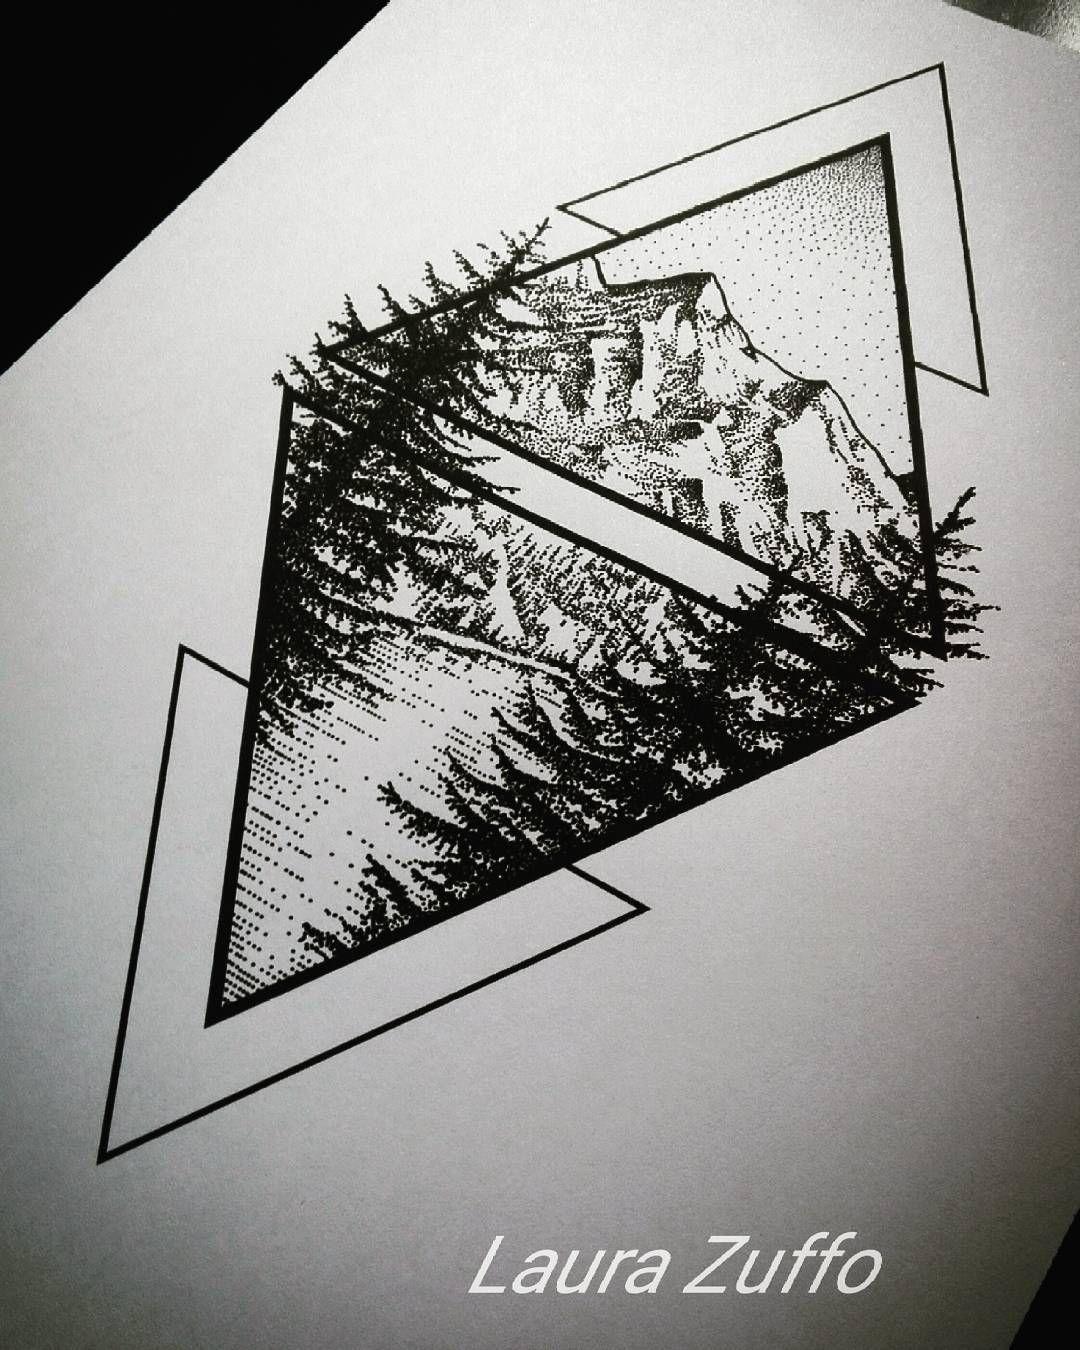 تتو مثلث و درخت